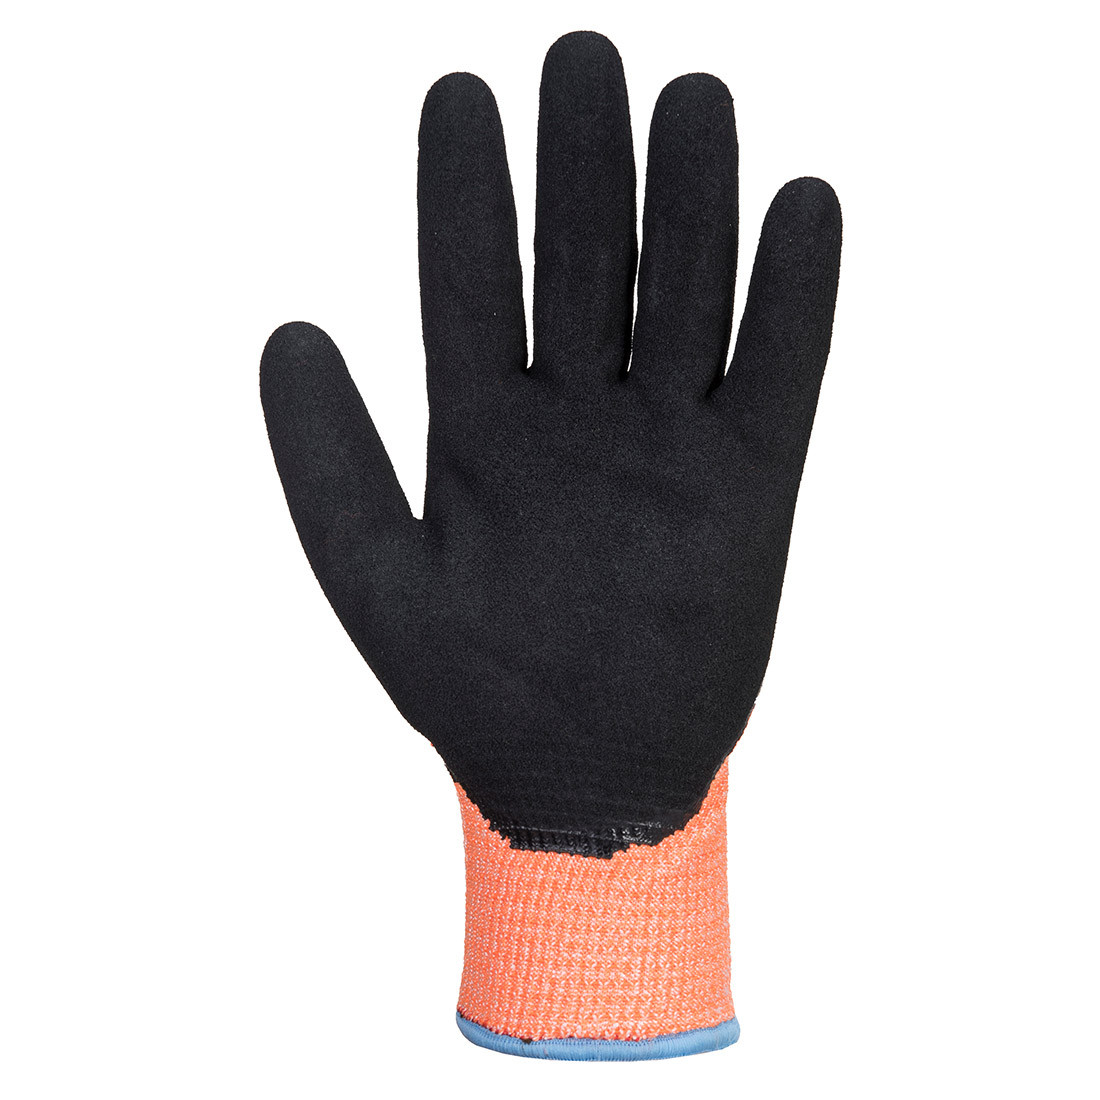 Manusi Nitril Vis-Tex Winter HR Cut - Echipamente de protectie personala